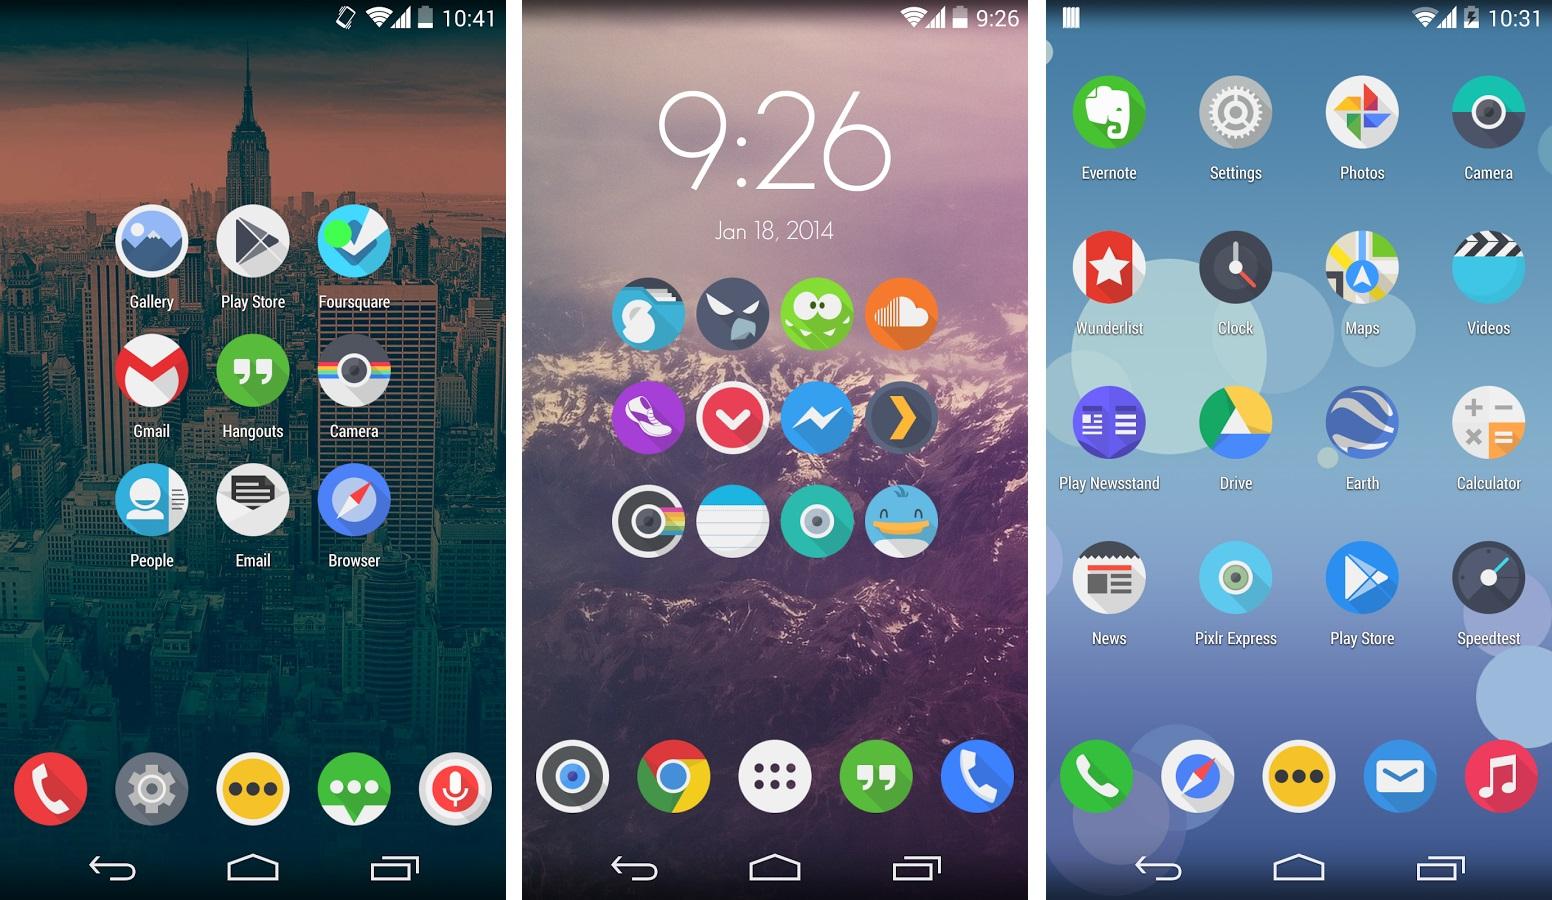 Phone Choosing An Android Phone 5 reasons to still choose an android phone over iphone tech click ui 1 99 jpg